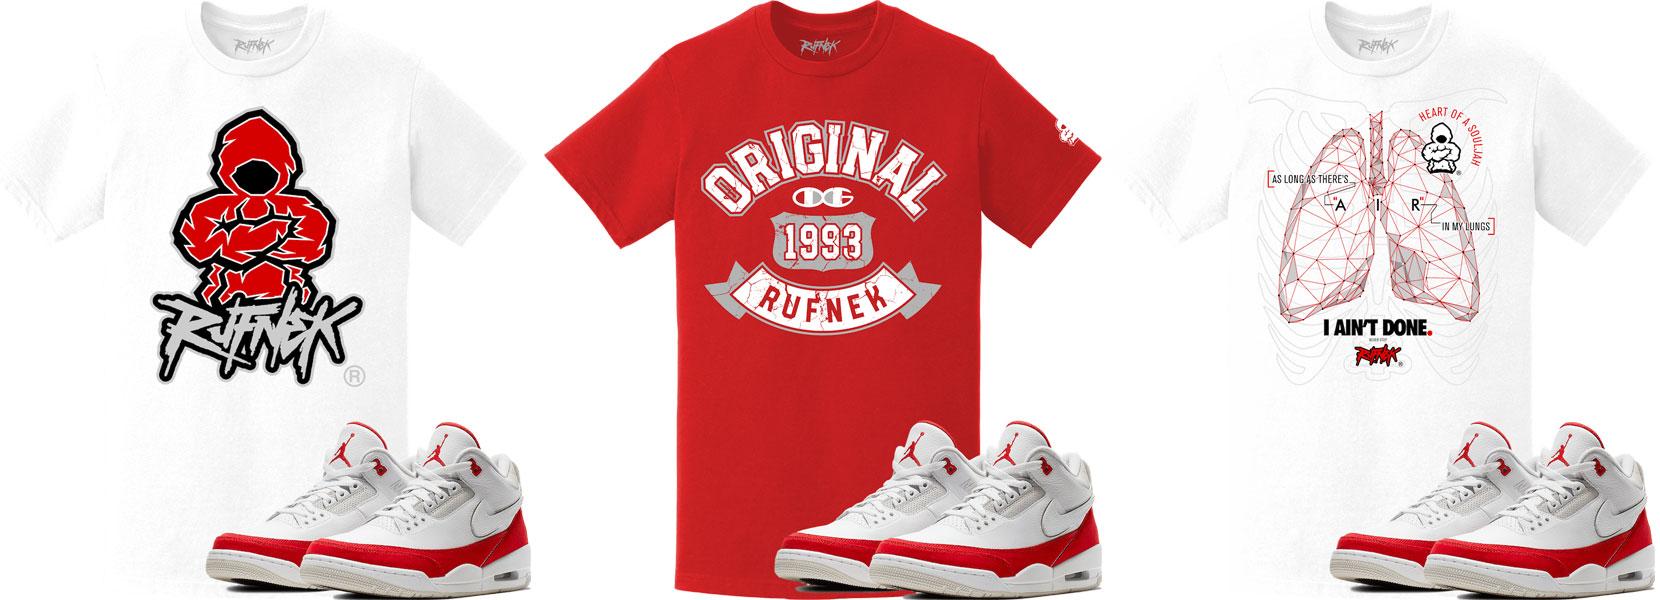 f6984e9b83191a Jordan 3 Tinker Air Max 1 Sneaker Shirts